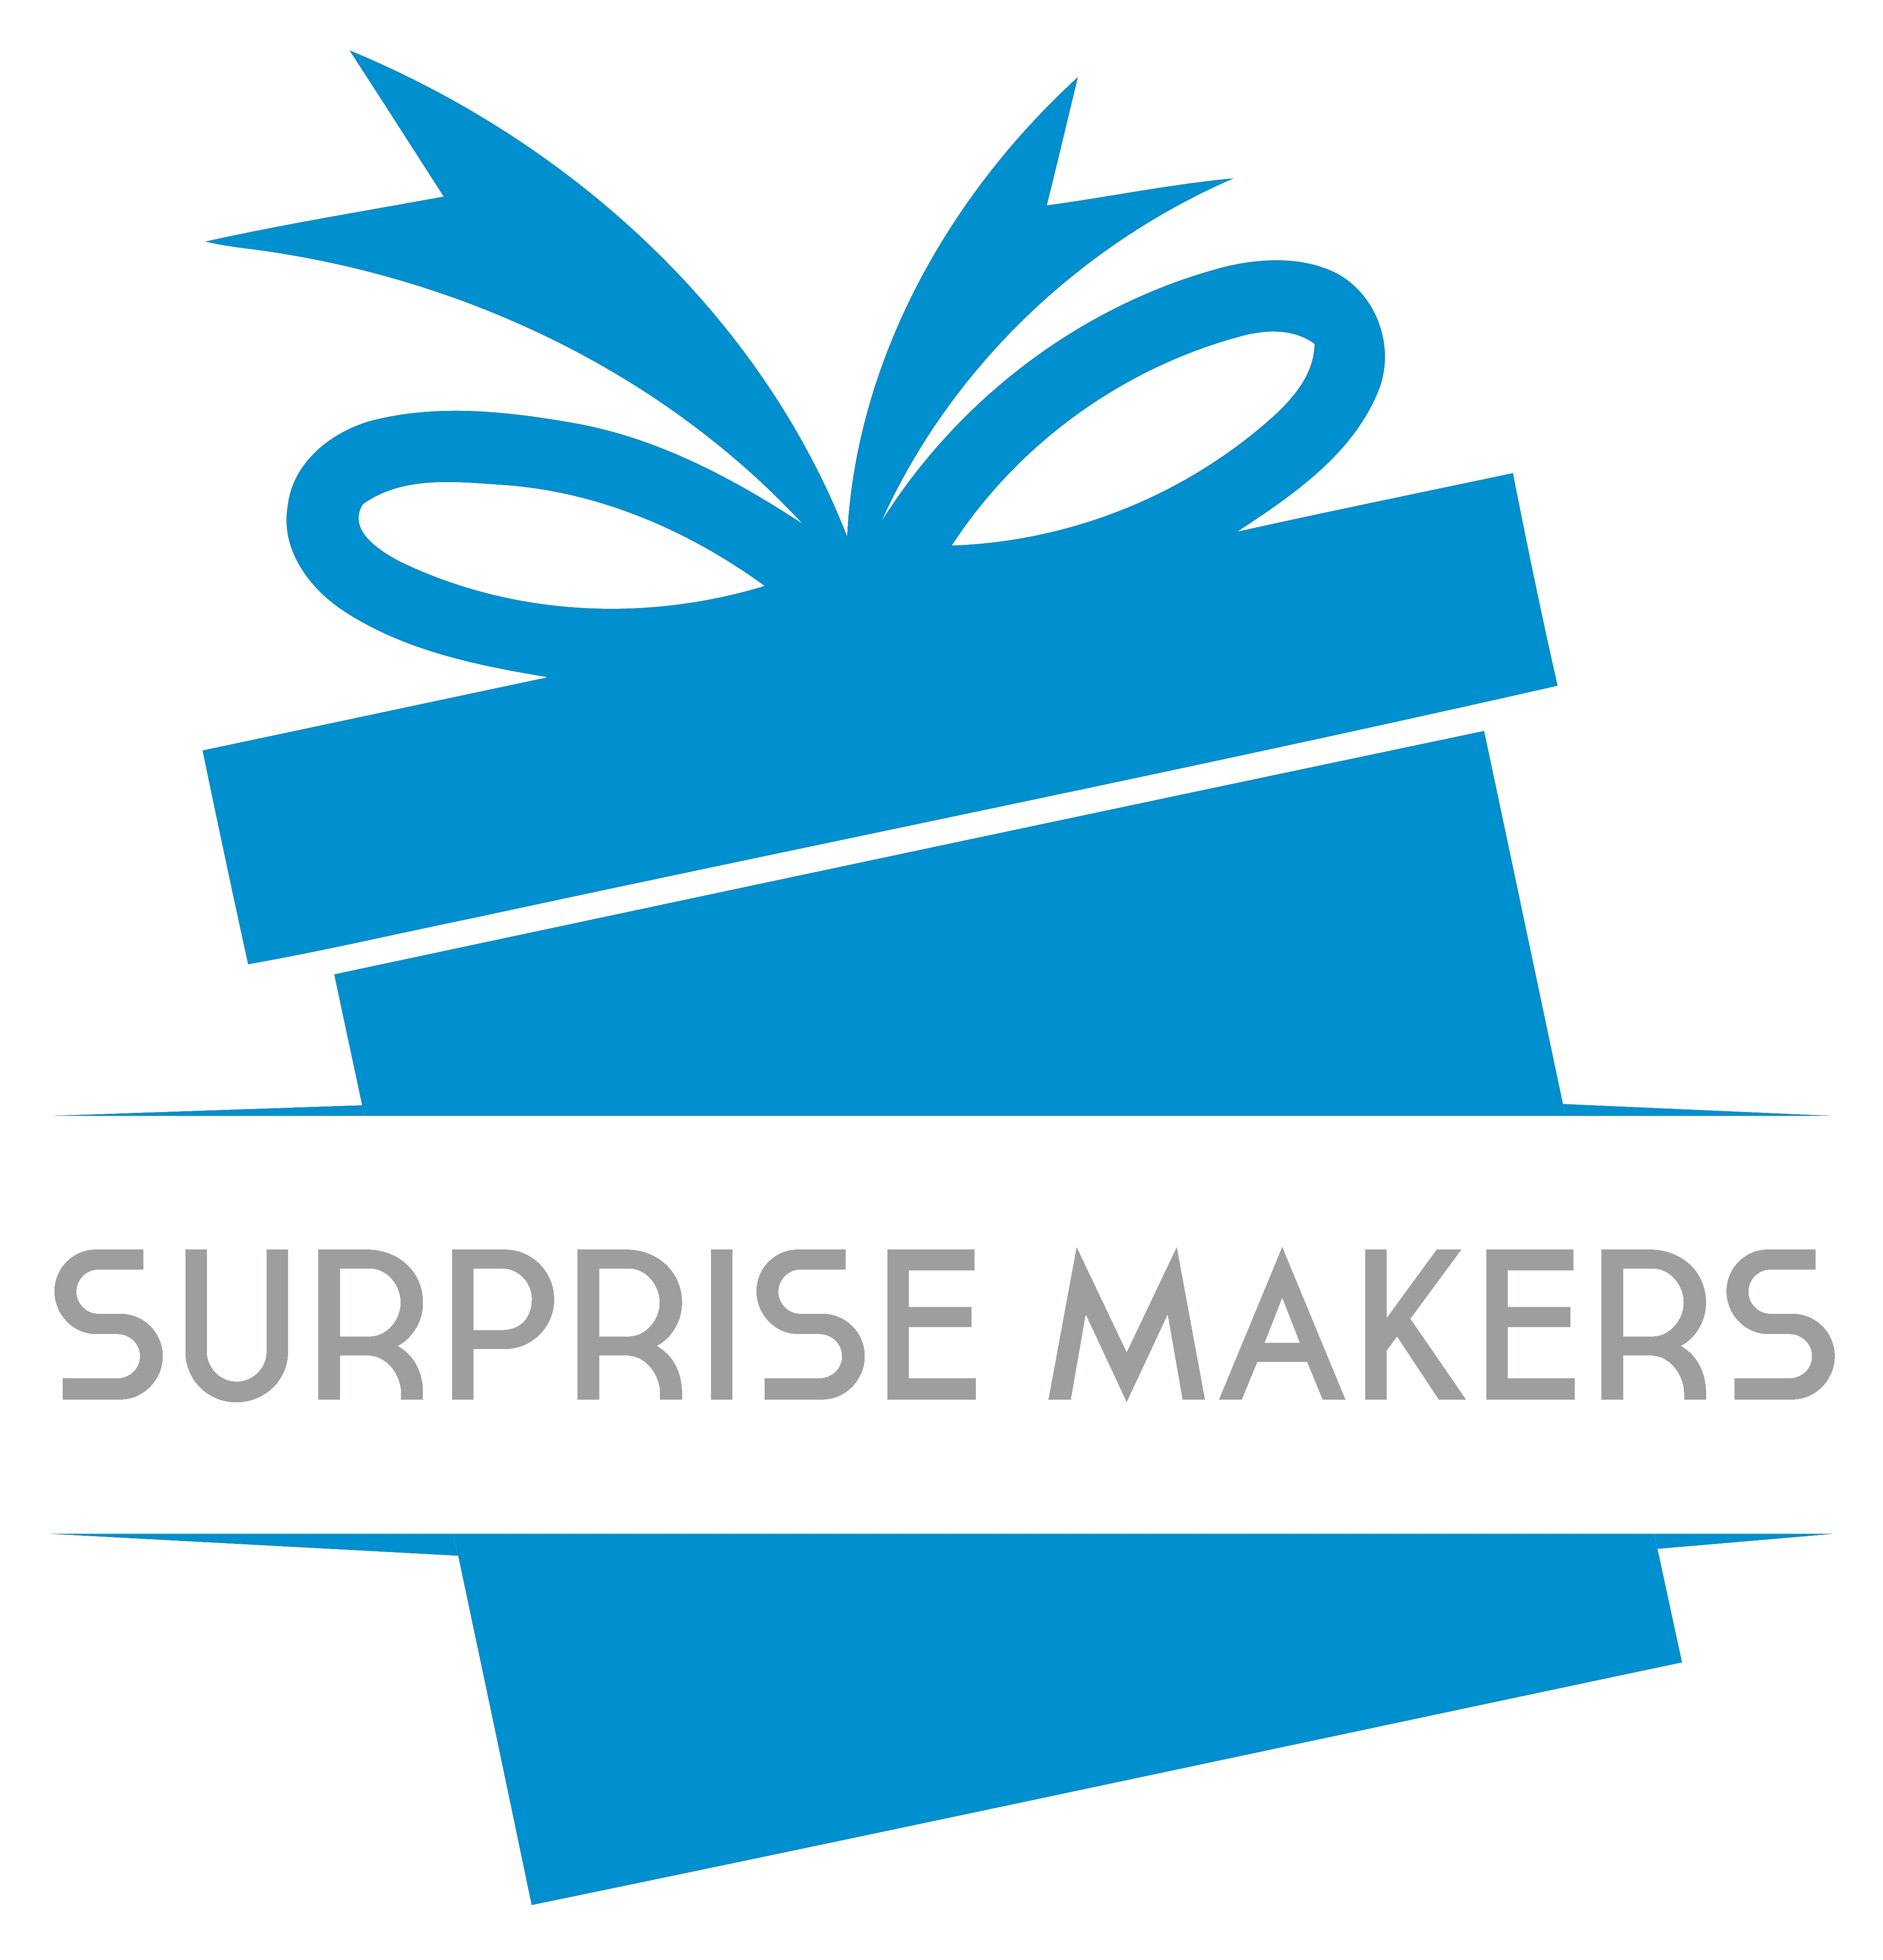 Surprise Makers